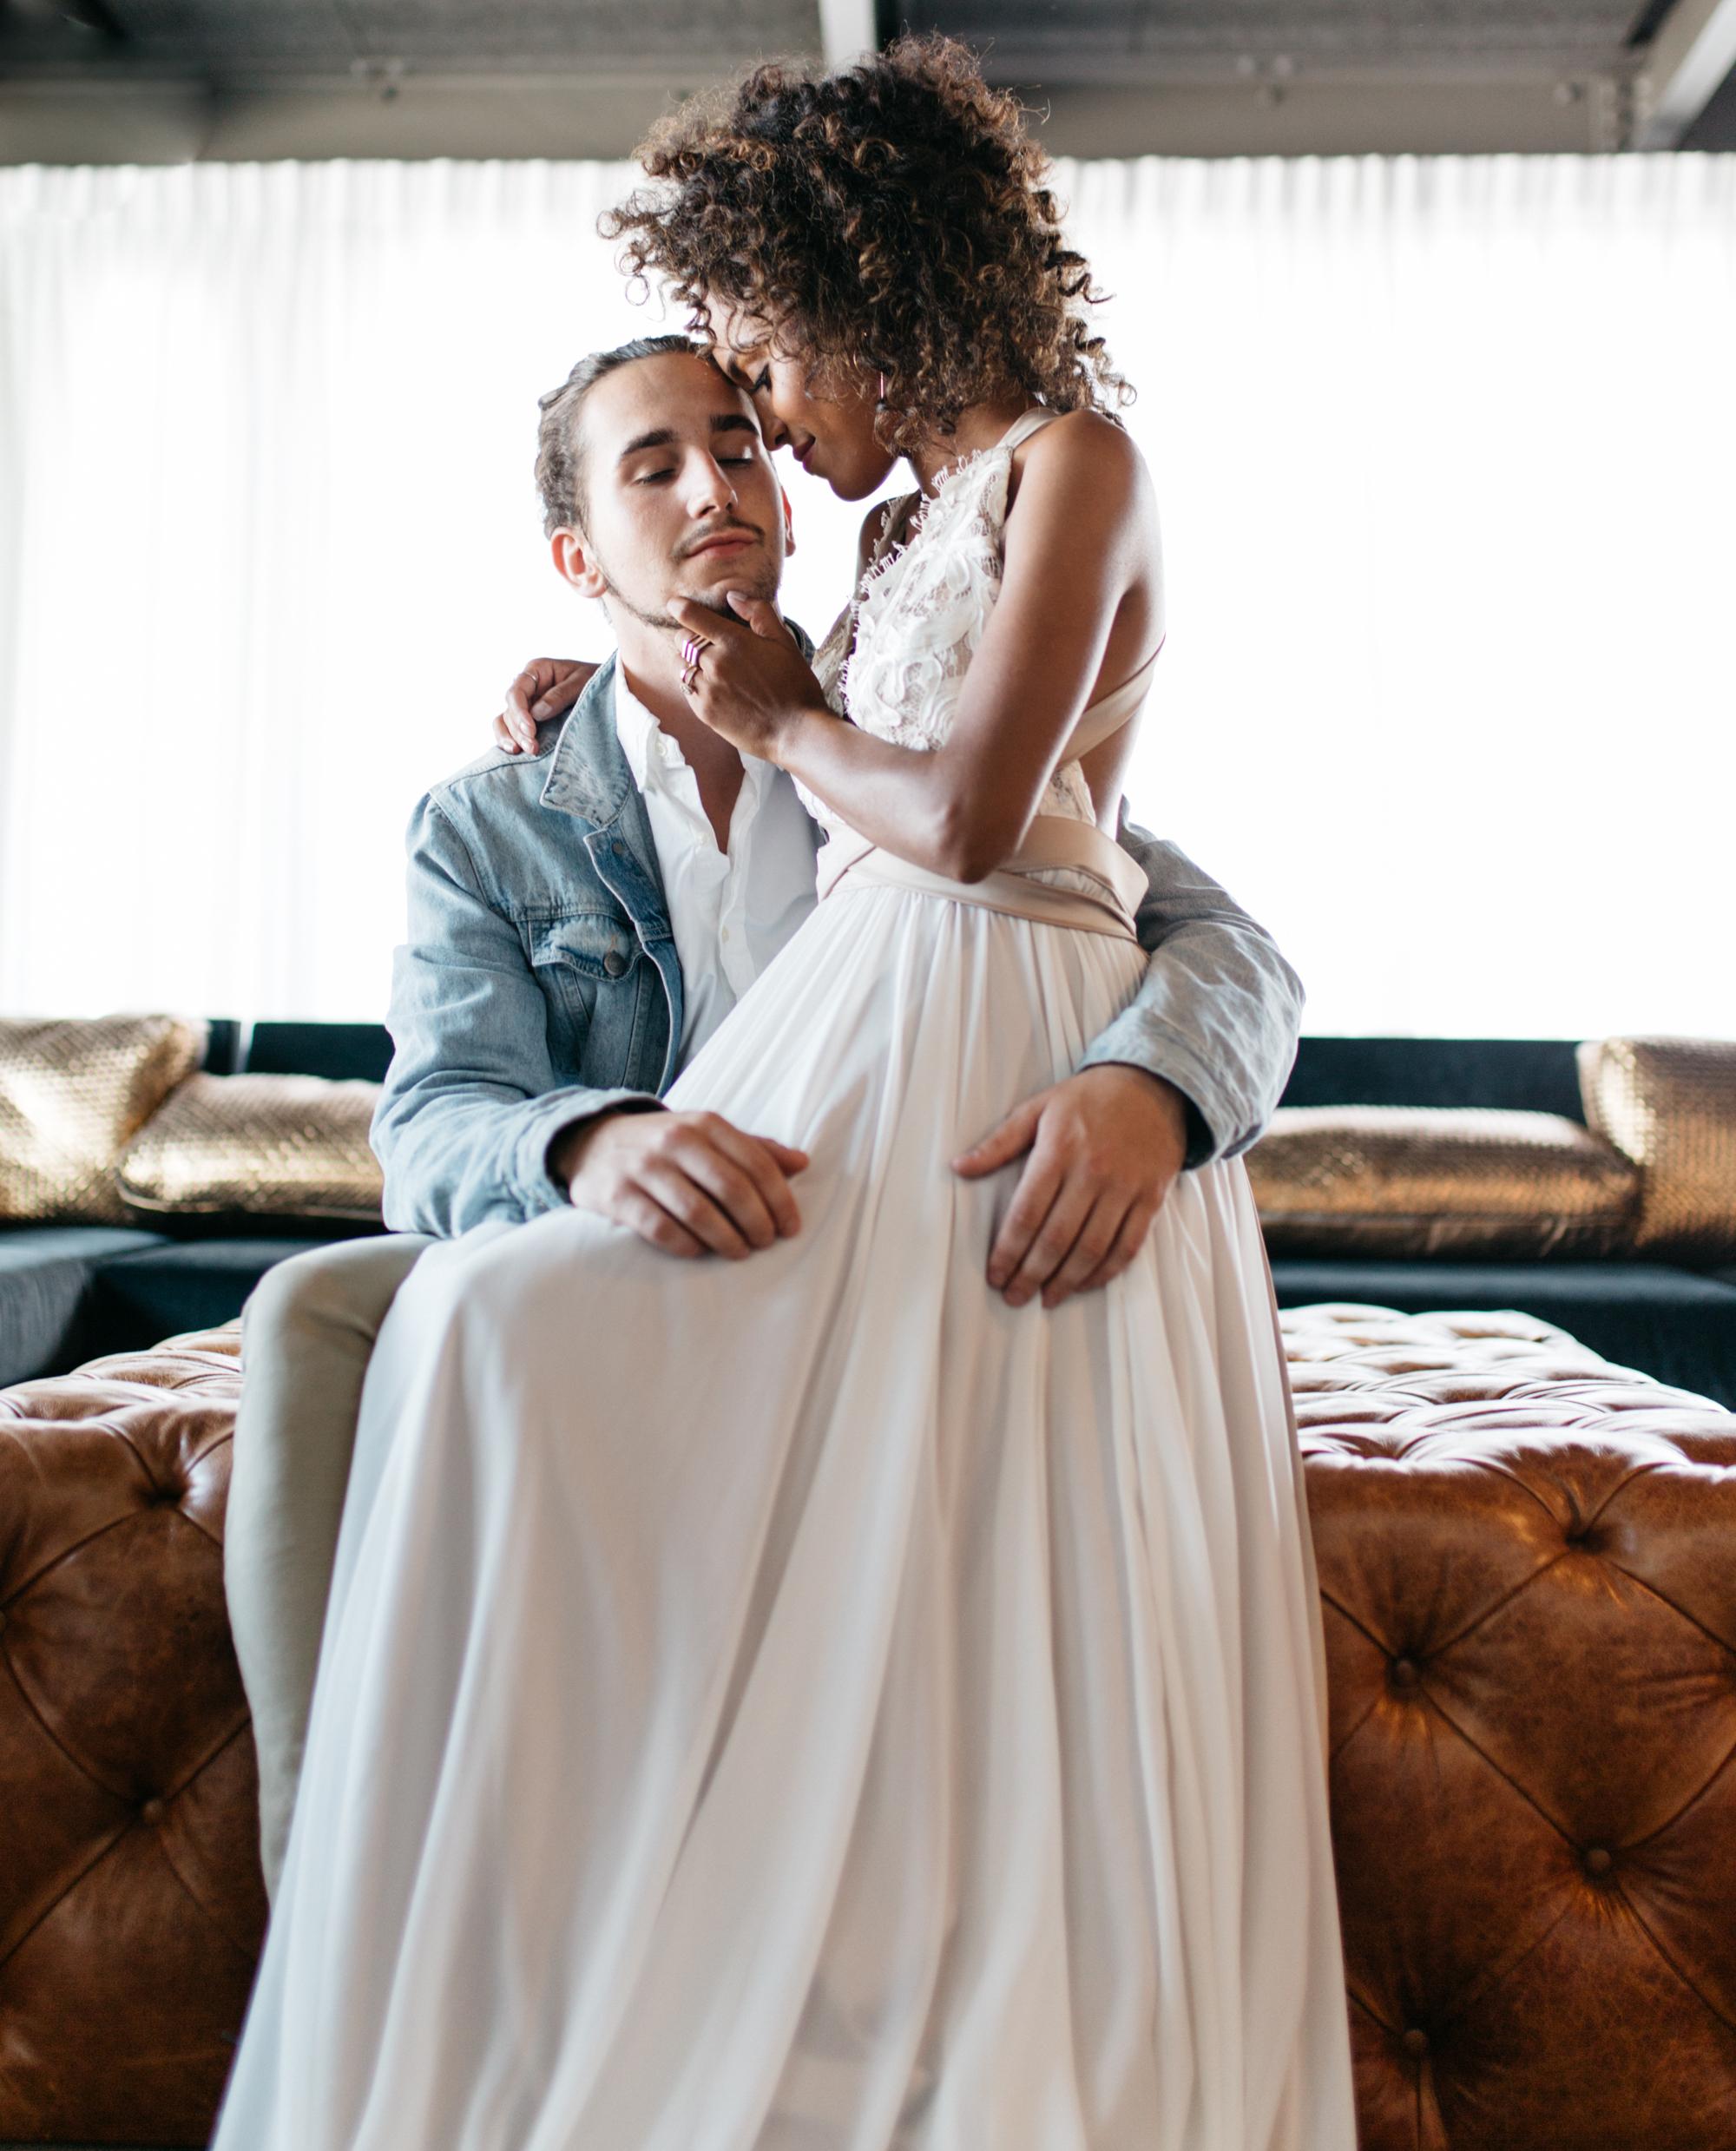 SamErica Studios - Modern Mixed Couples Styled Shoot-49.jpg